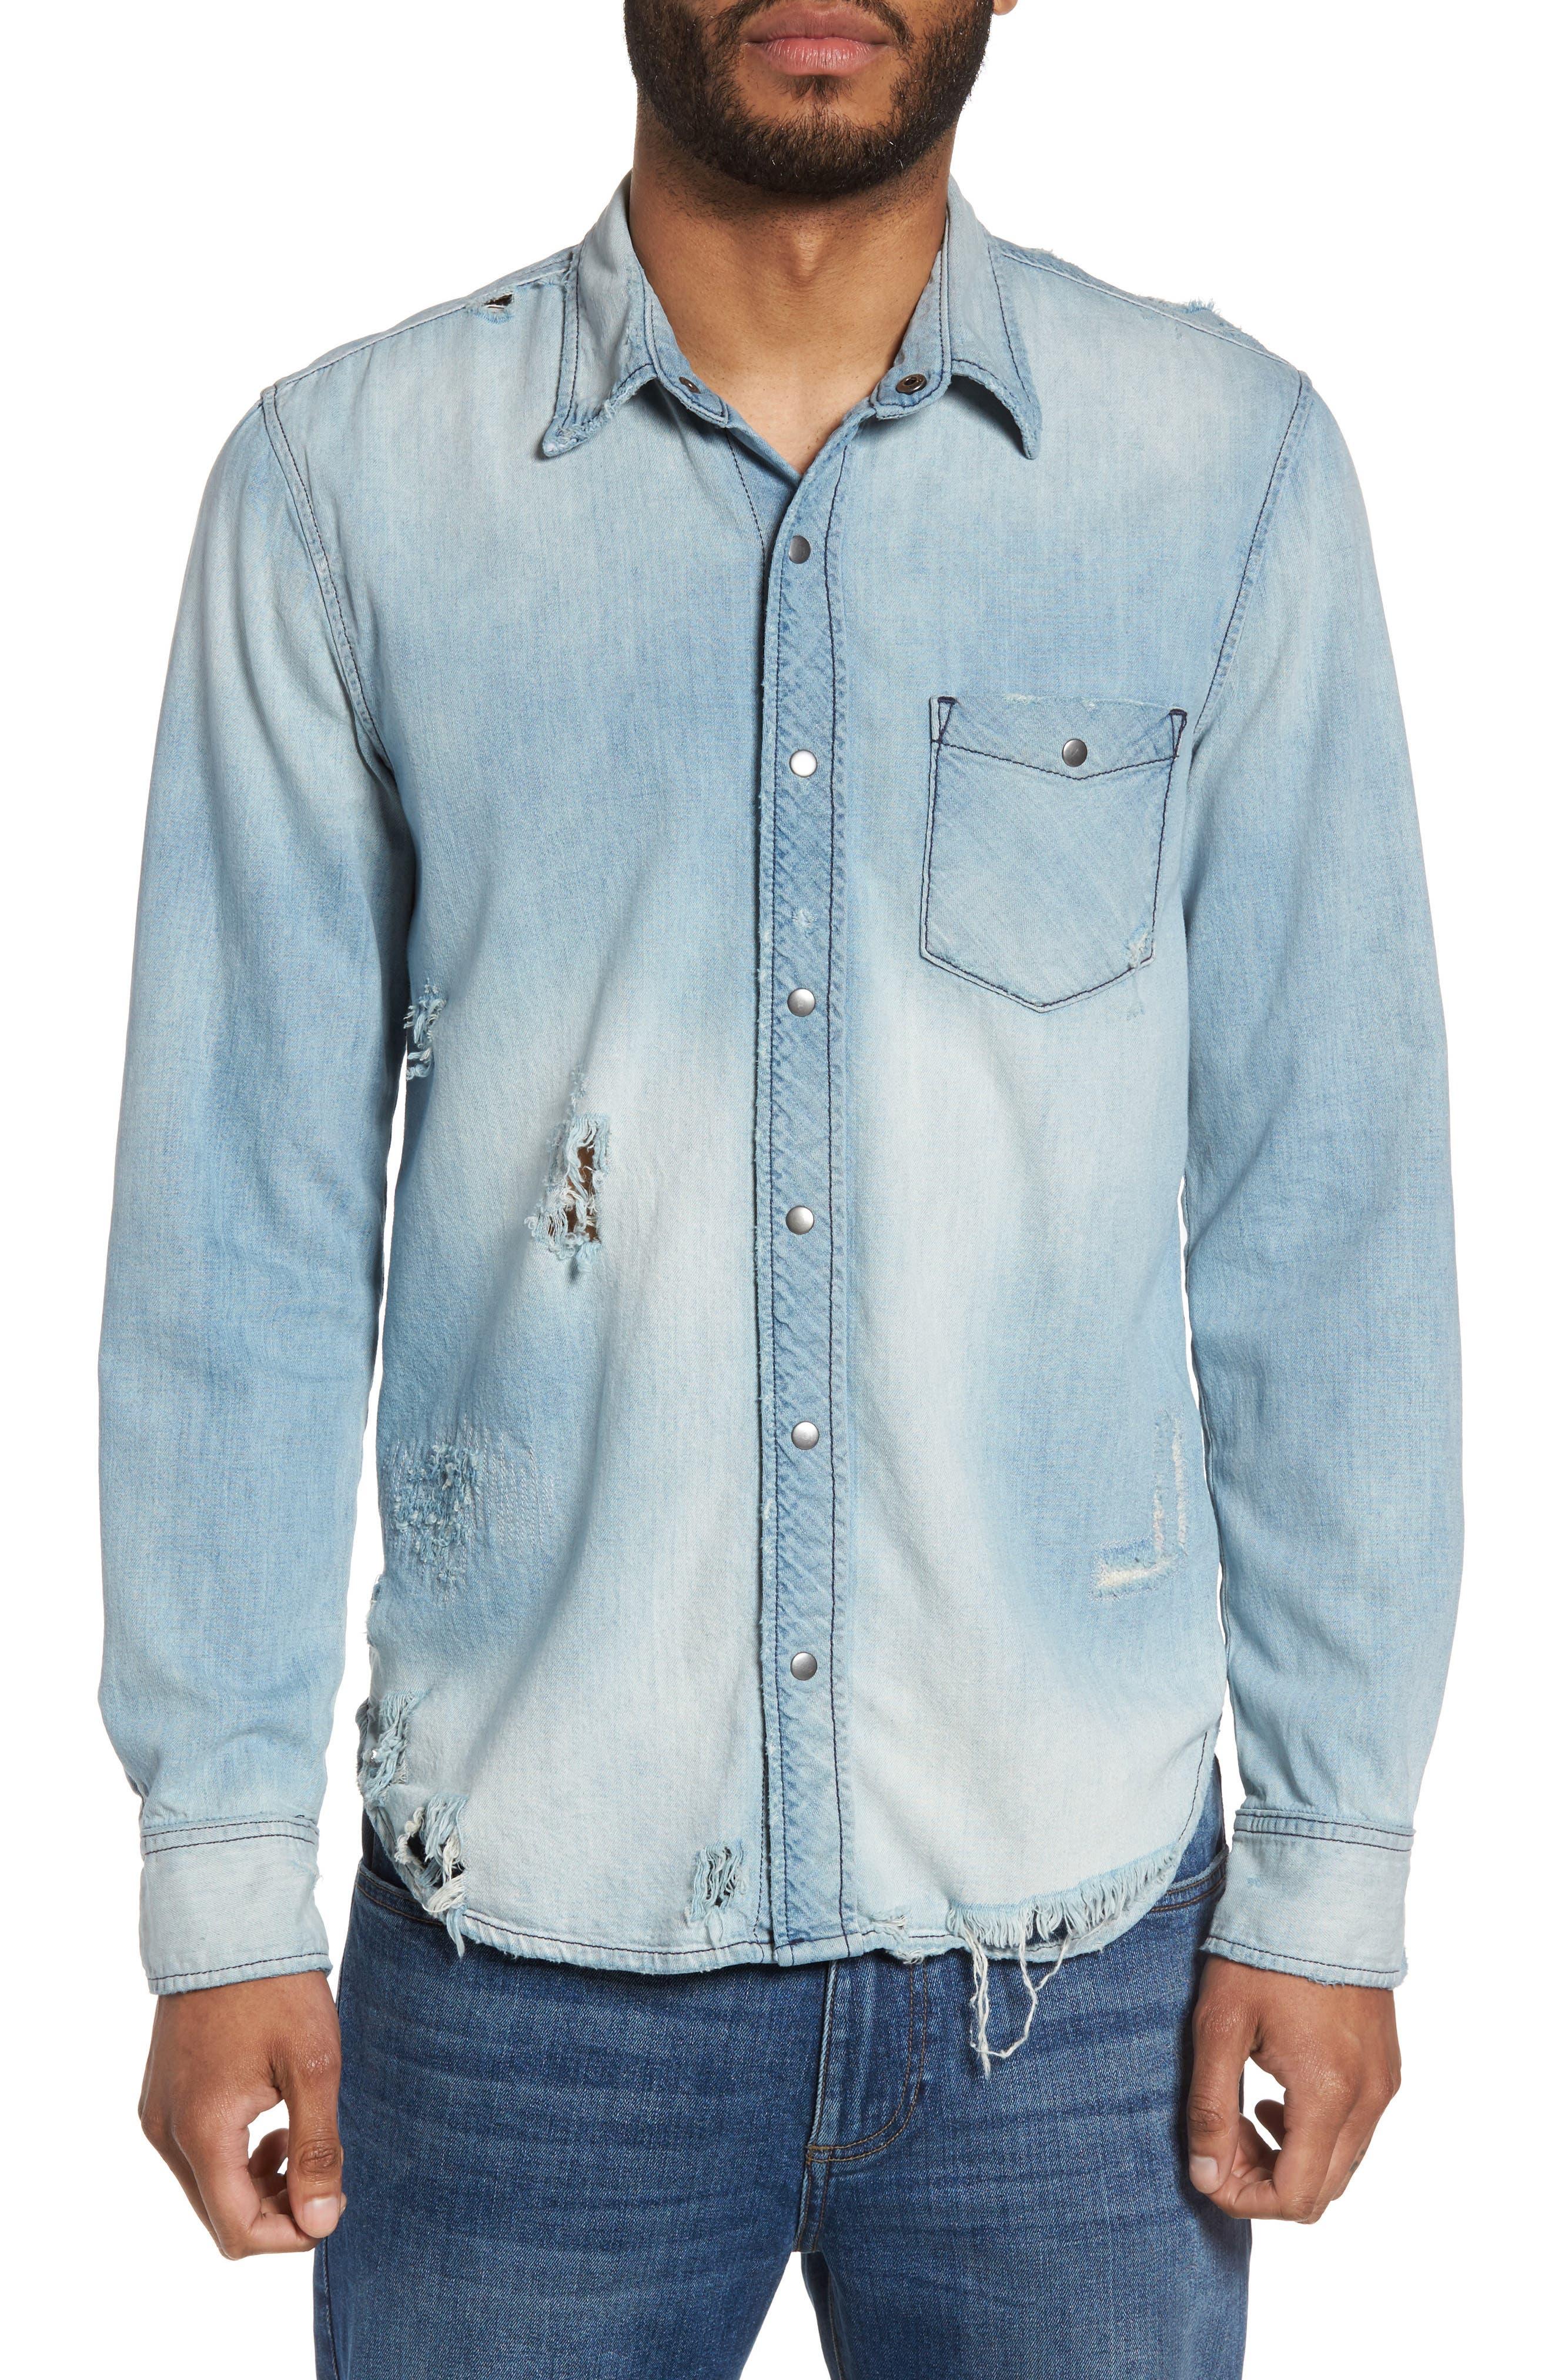 Main Image - Hudson Weston Slim Fit Destructed Denim Shirt